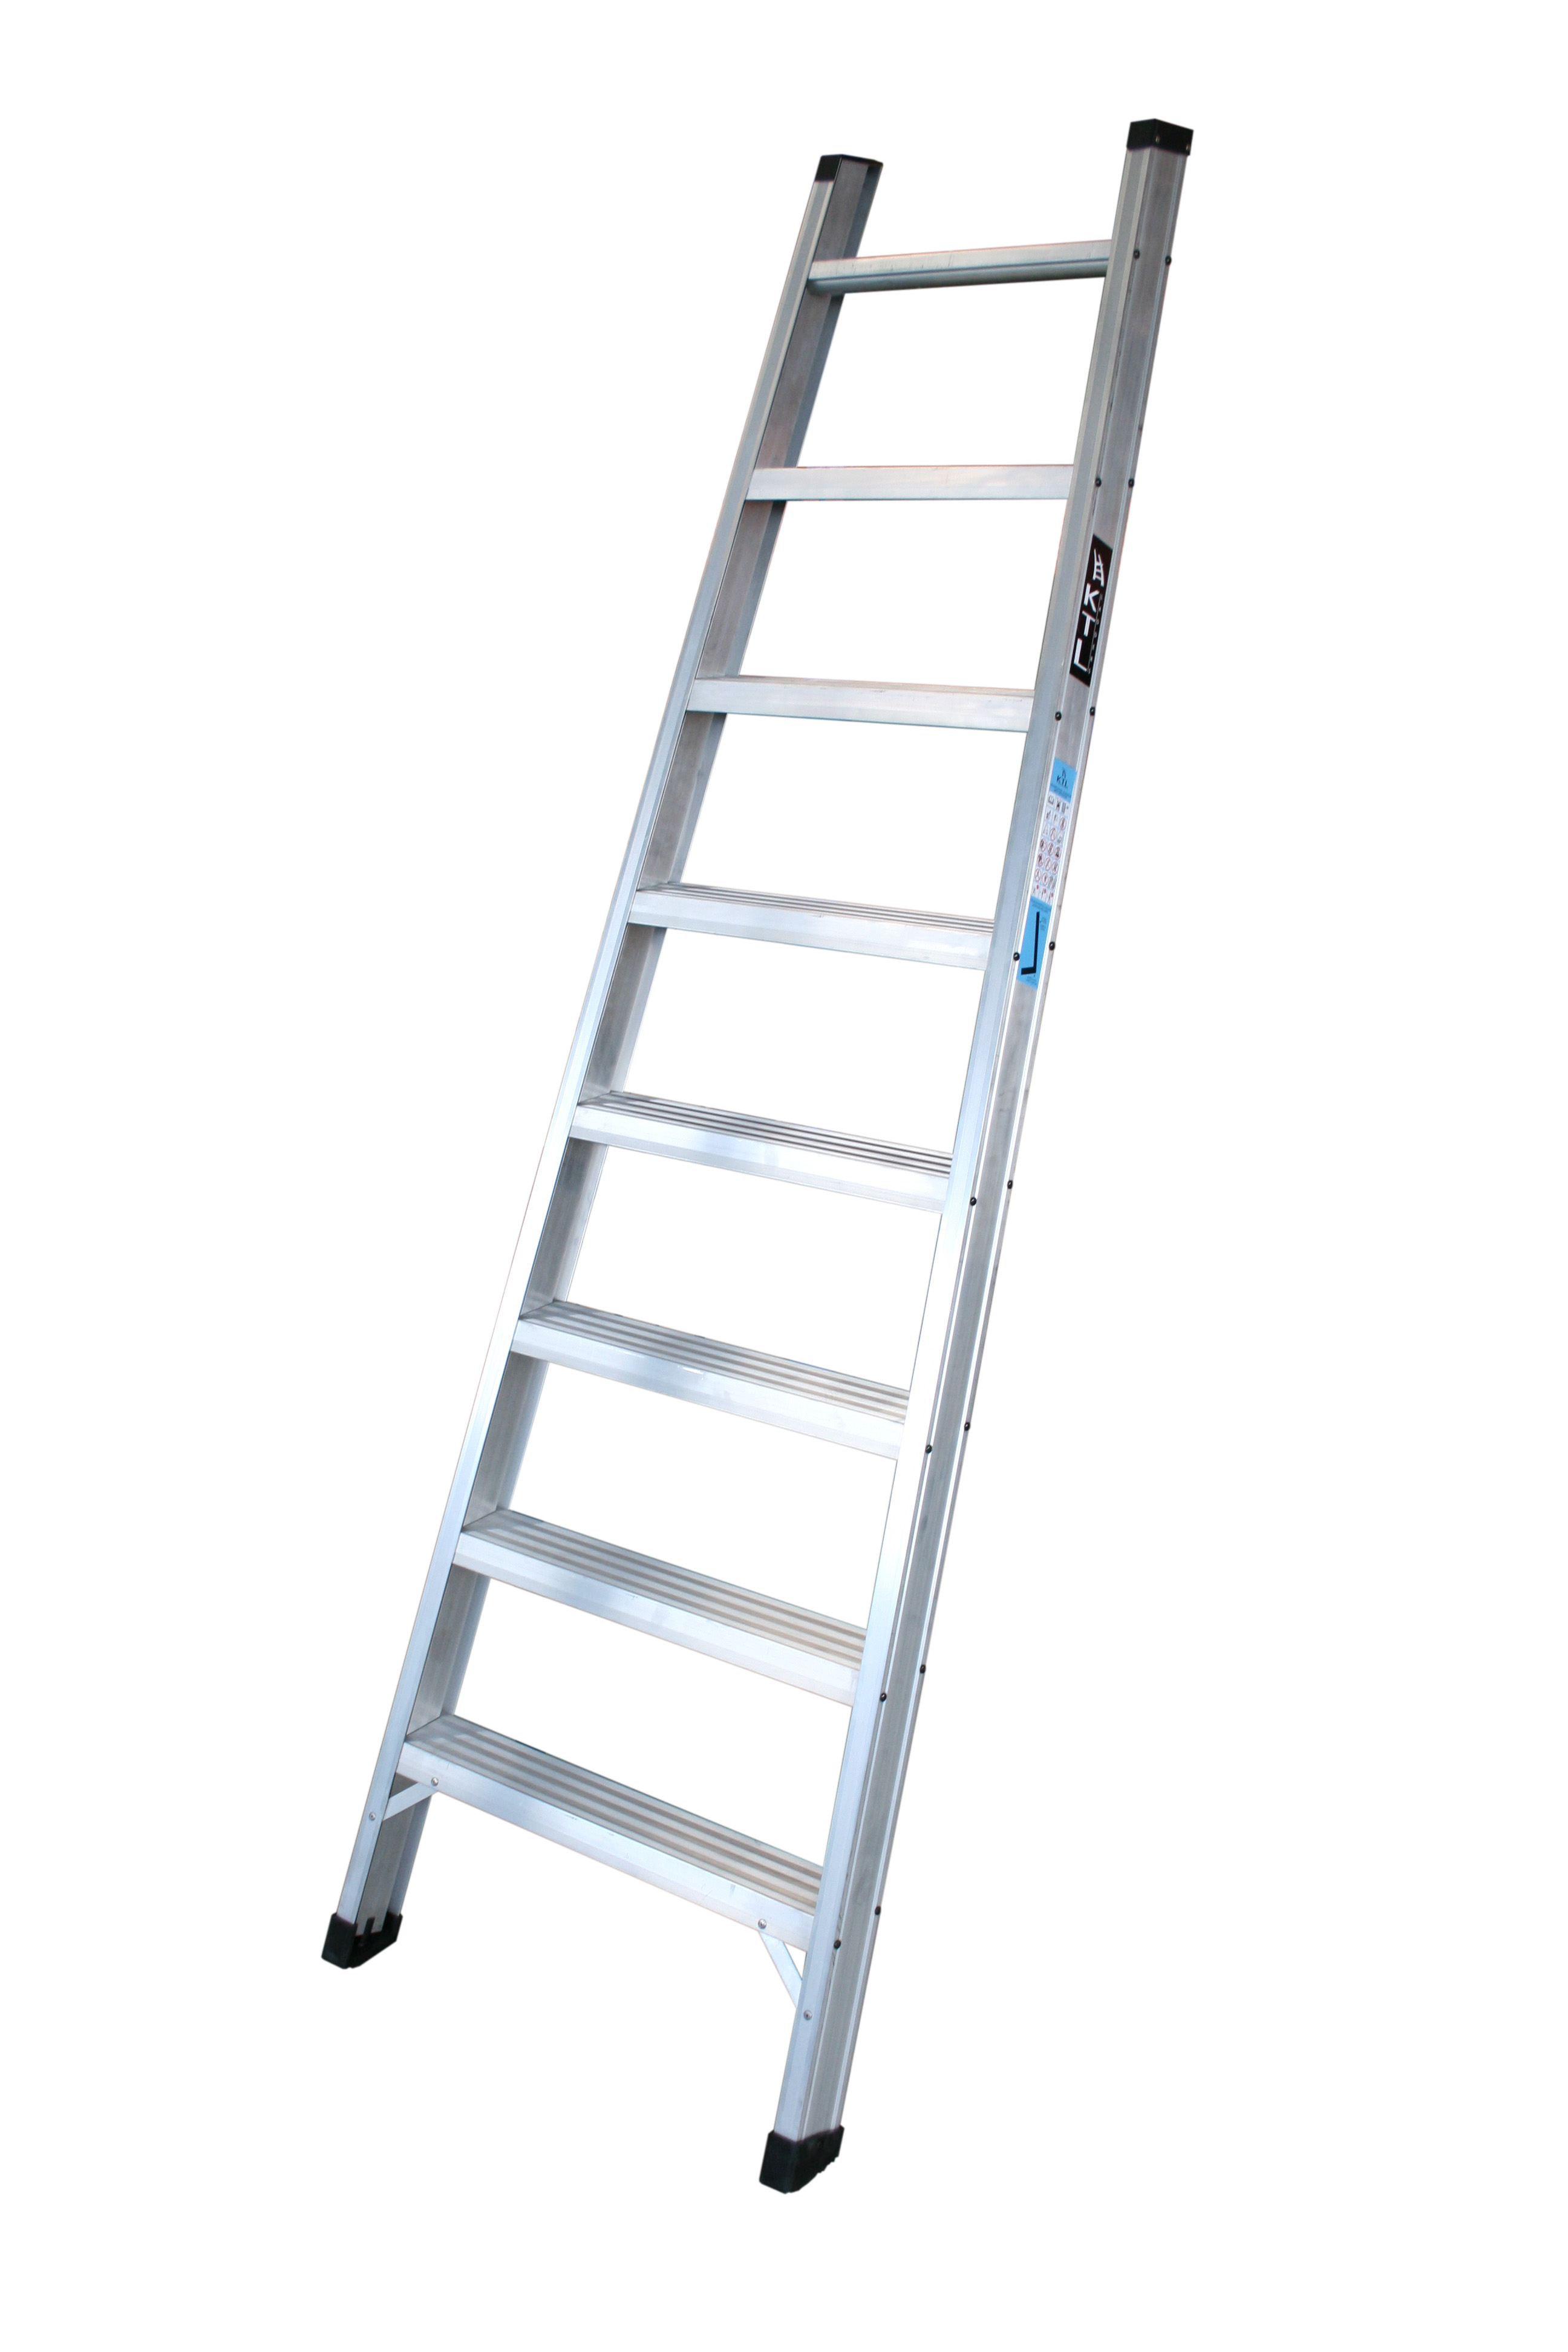 escalera de tijera xl Escalera de apoyo COMFORT escalera apoyo 8peld